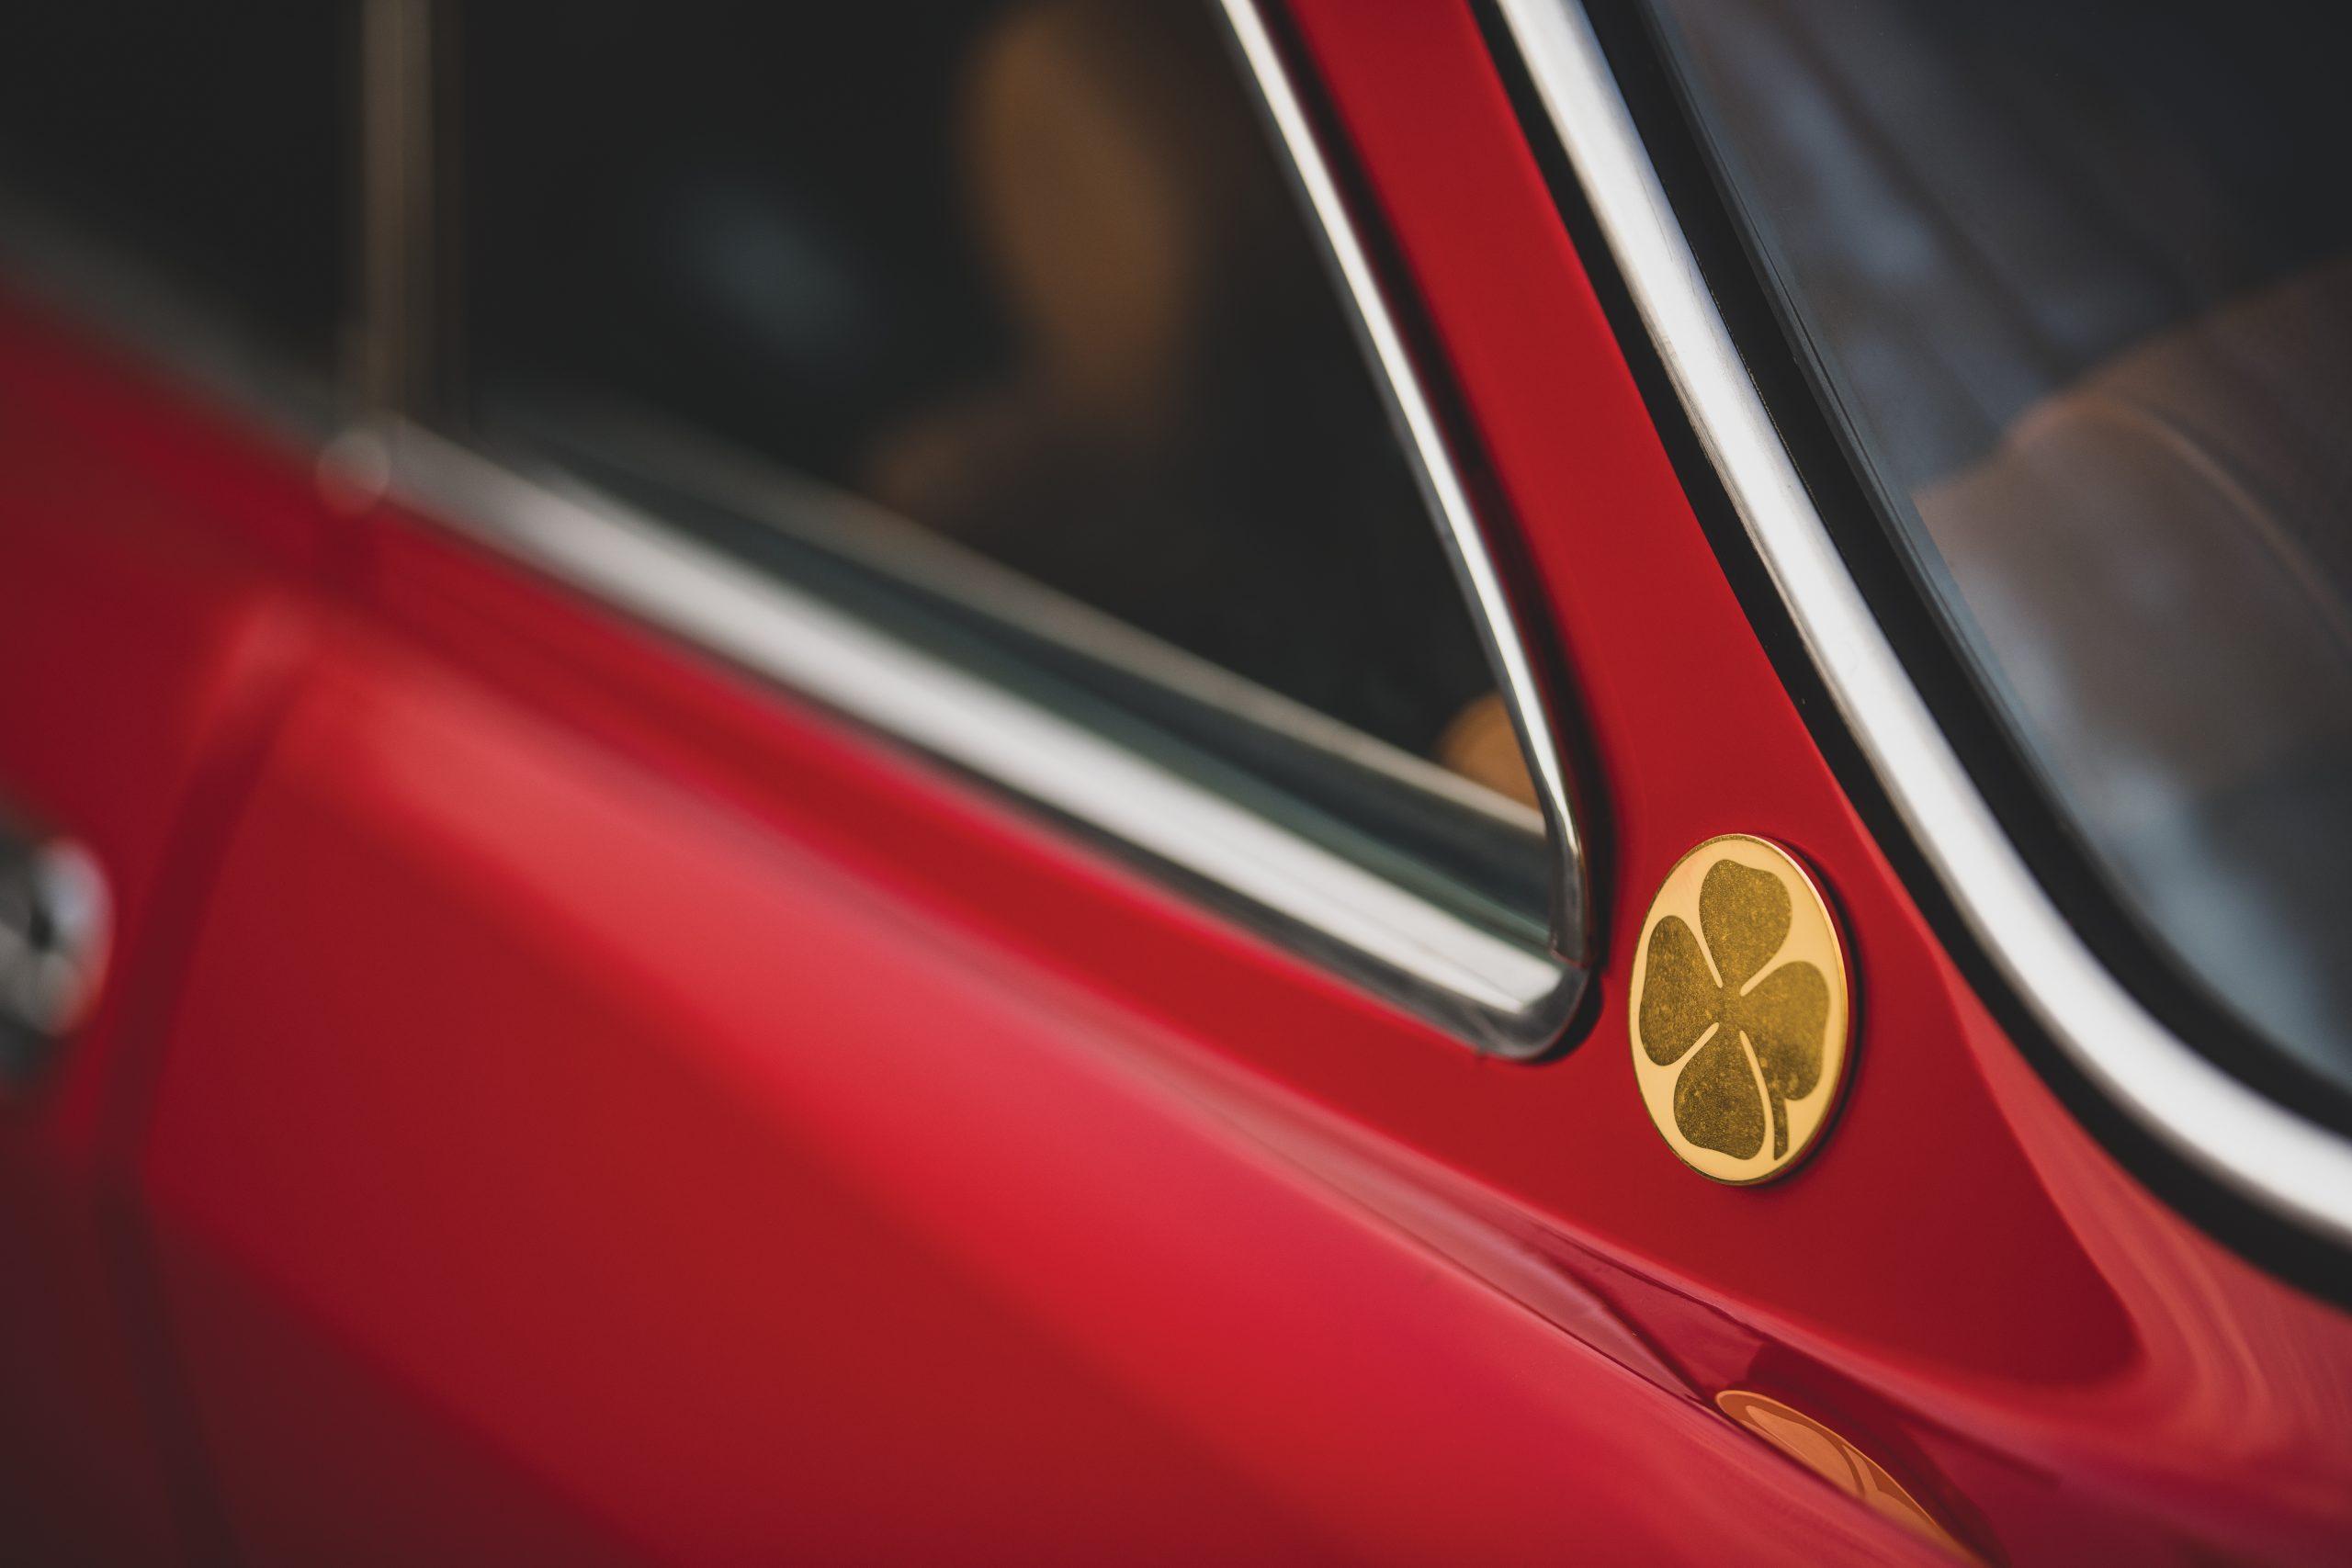 1969-Alfa-Romeo-1750-GT-Veloce shamrock